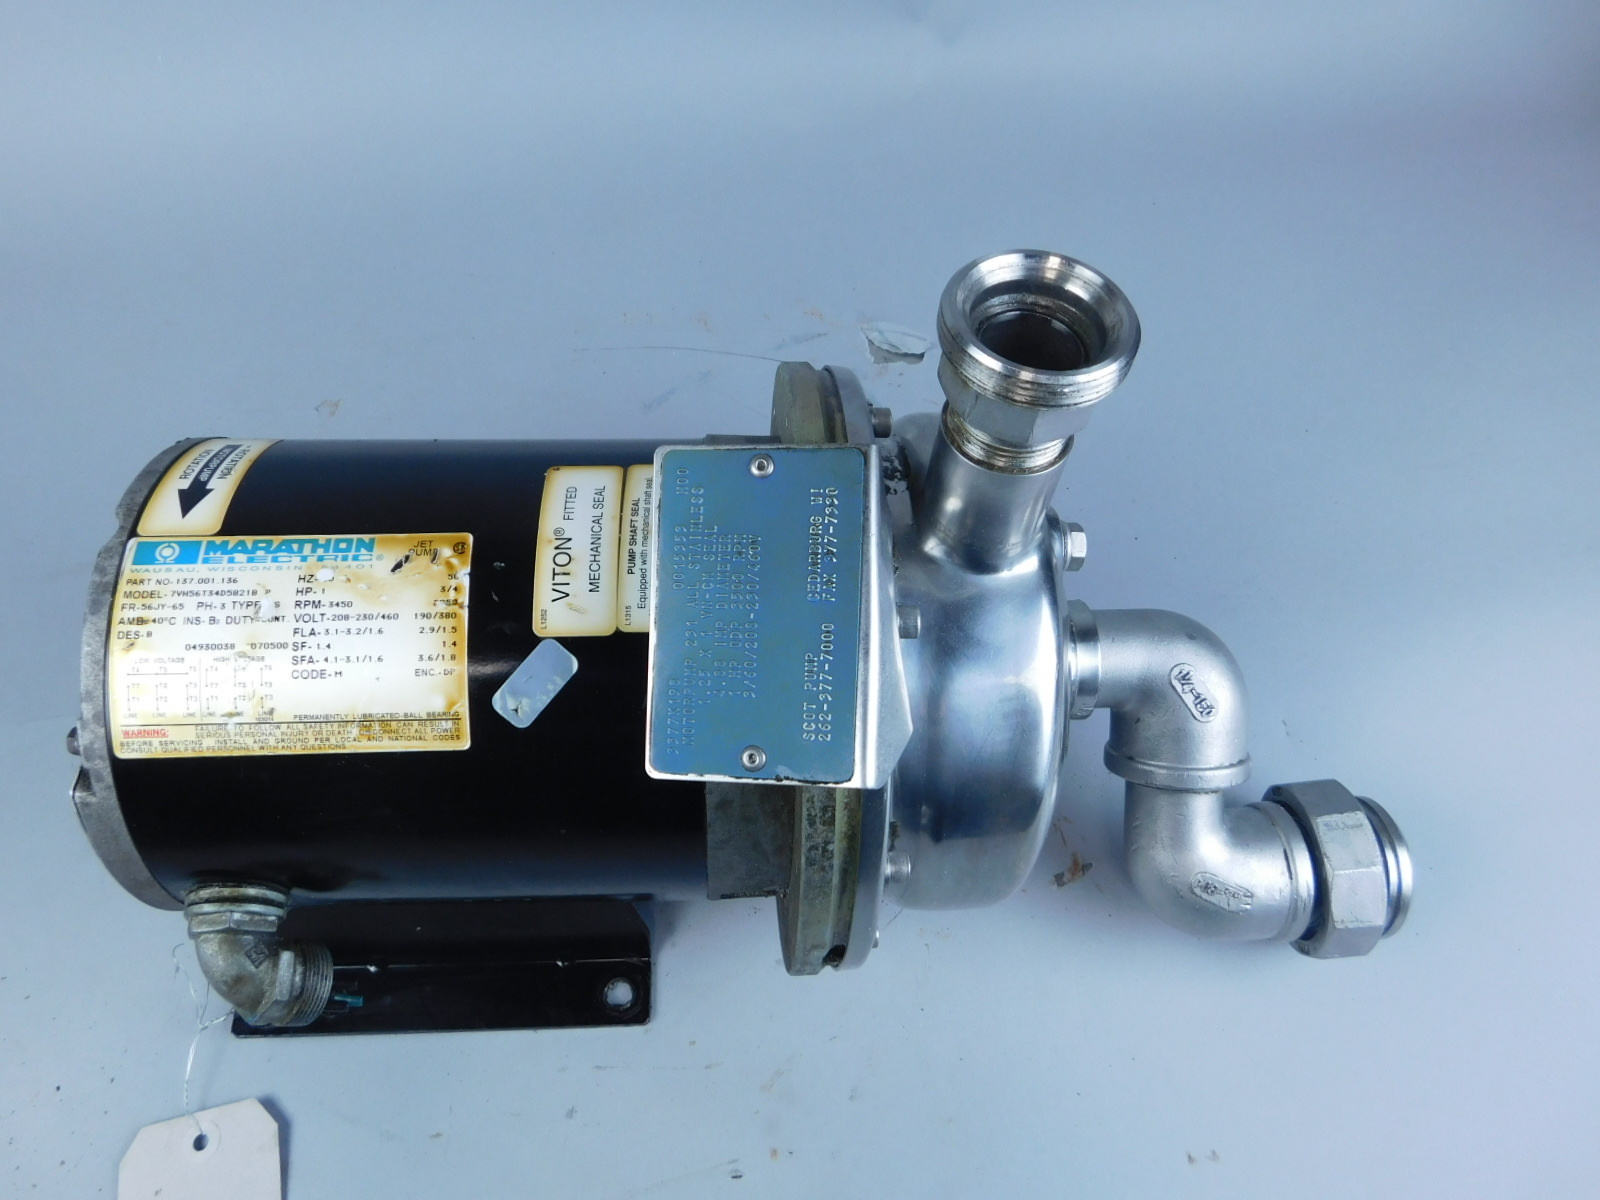 Marathon 1HP 137 001 136 Pump Motor, 3450 RPM, 208-230/460V, 3PH W/ Scot  Pump 231